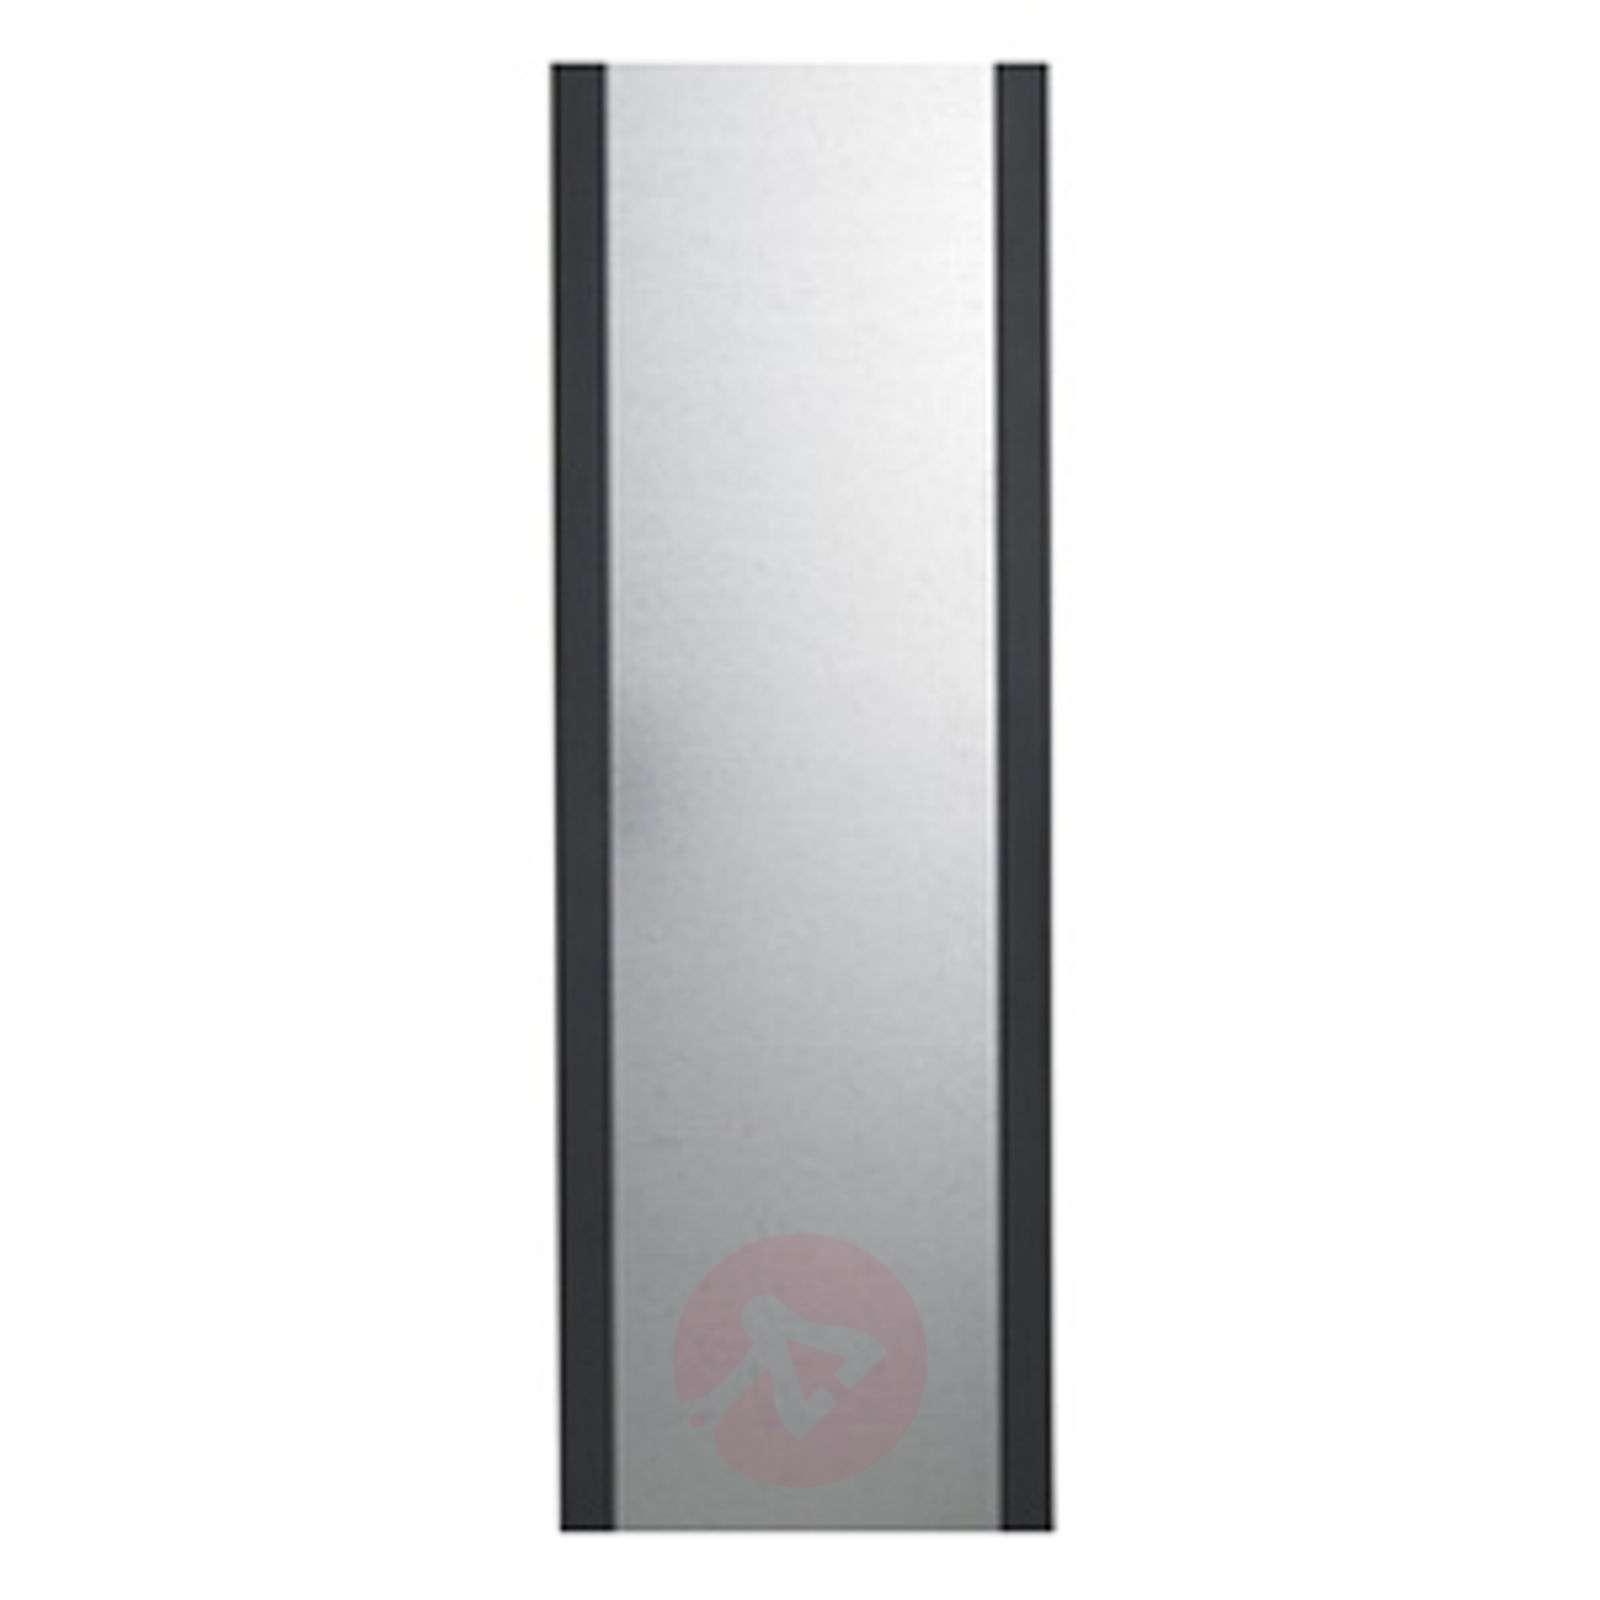 Elegant letterbox stand 1001-1045073X-01